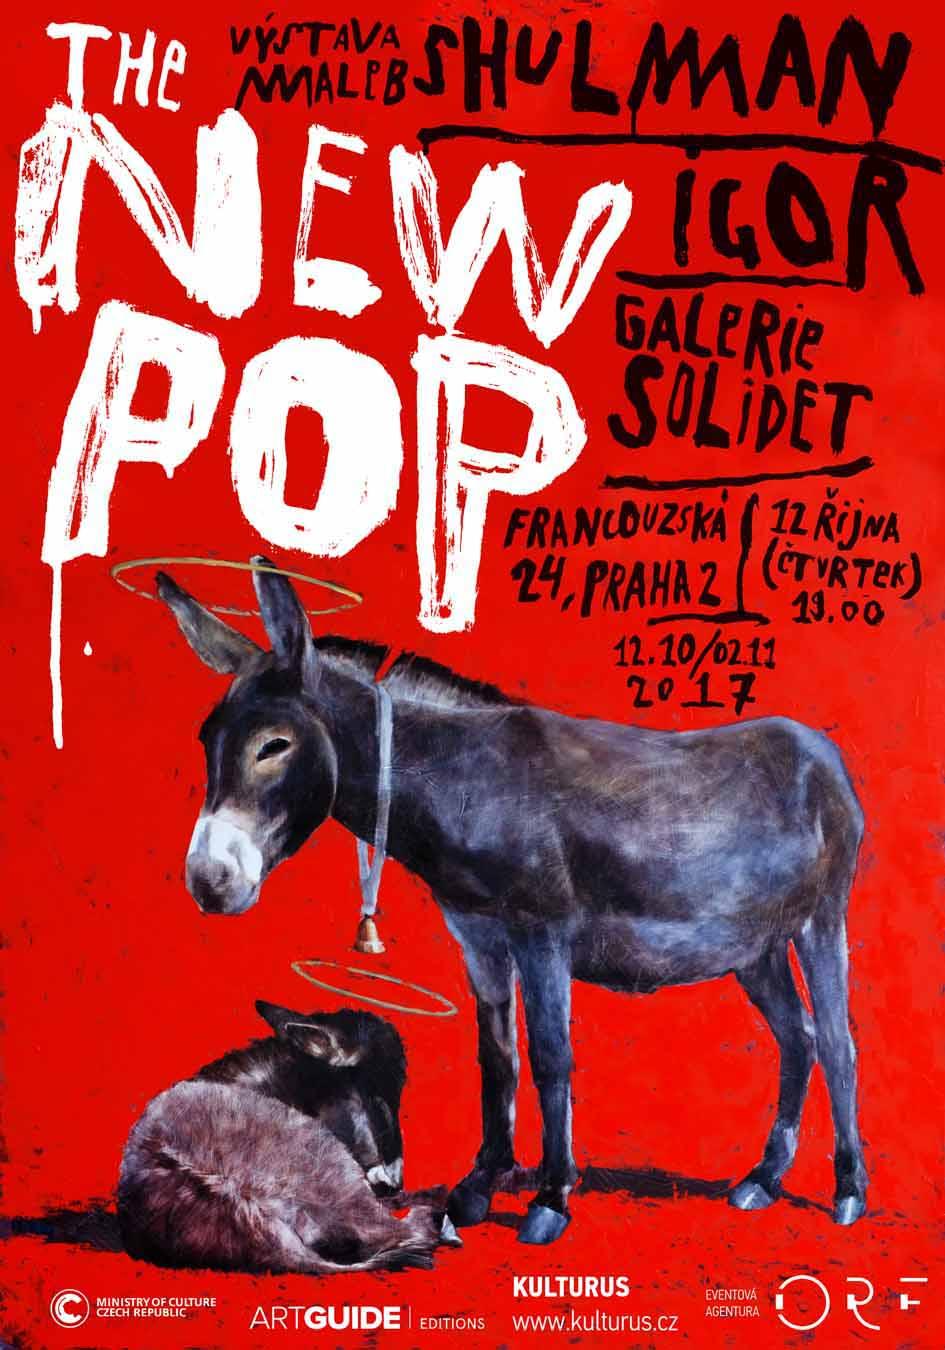 Igor Shulman Galerie Solidet & Kulturus